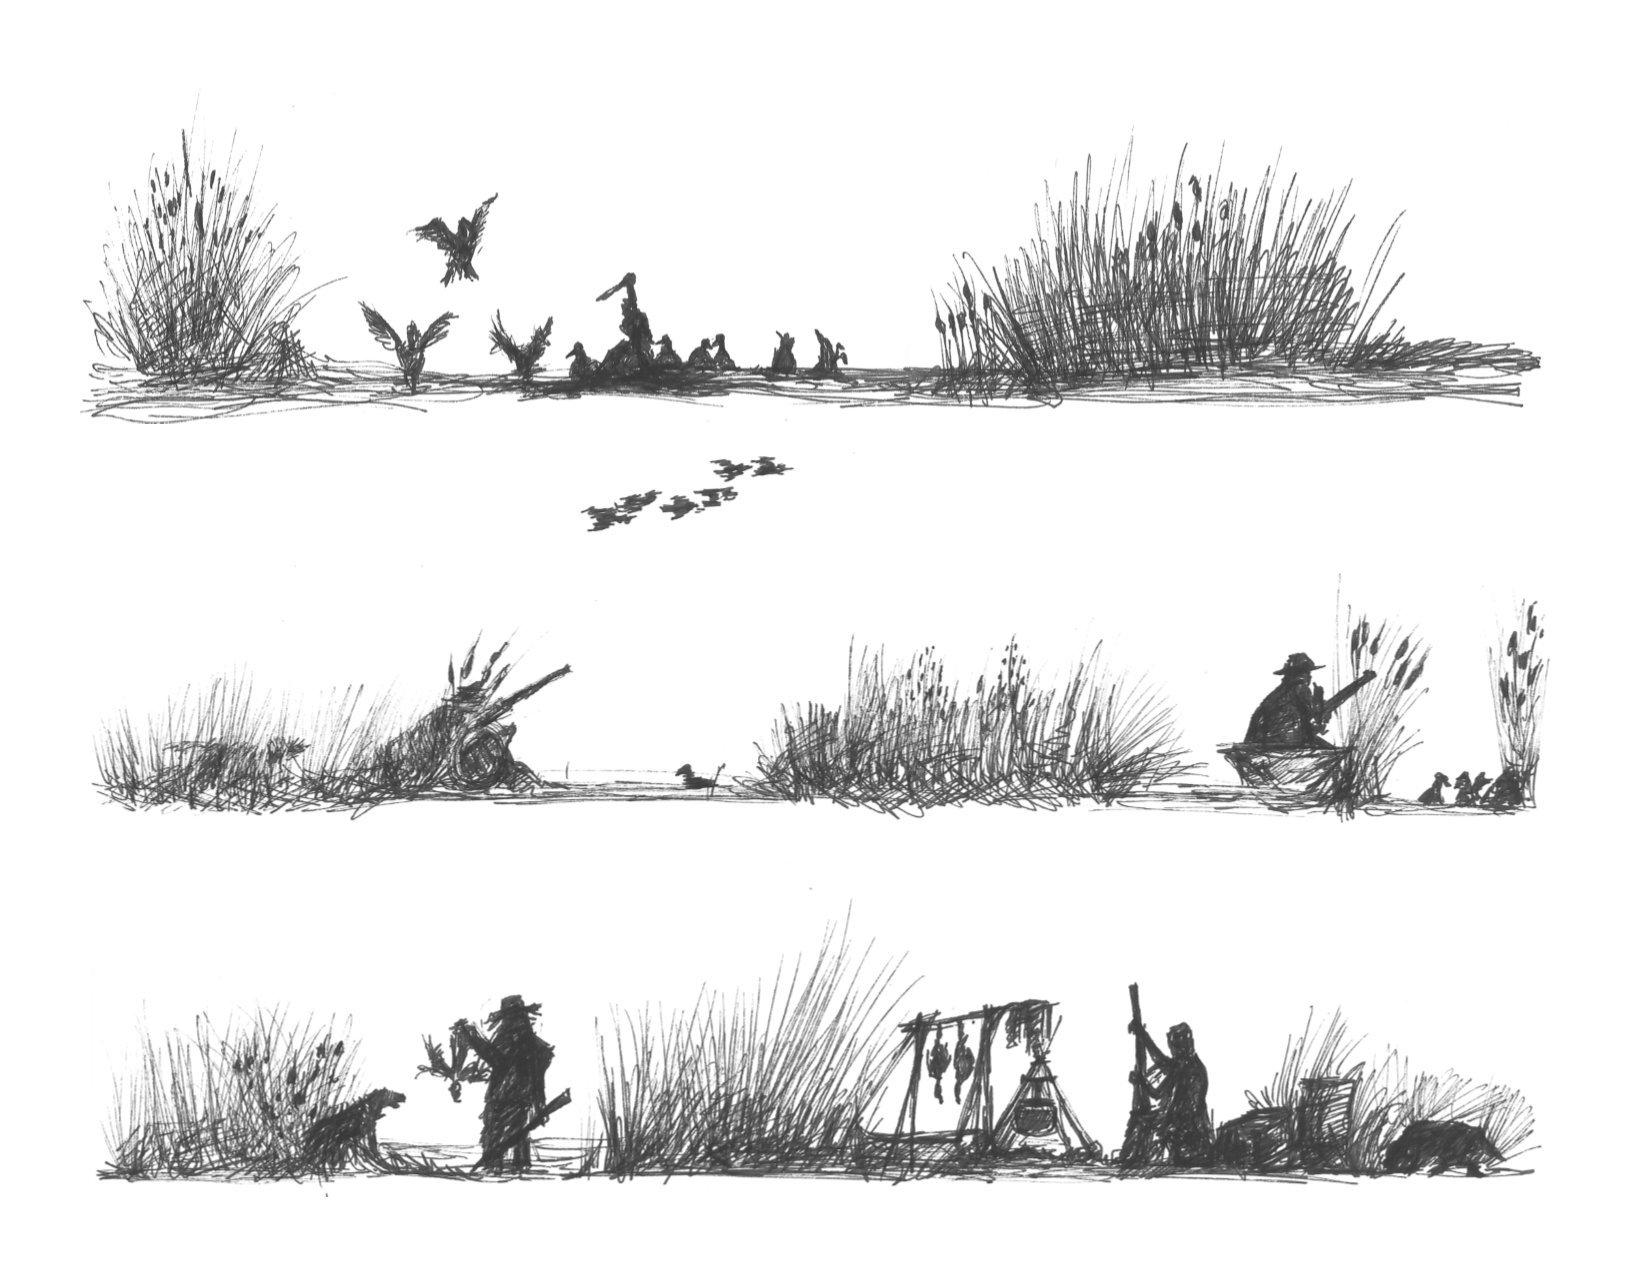 Duck Hunting Edible Icing Image Cake Border